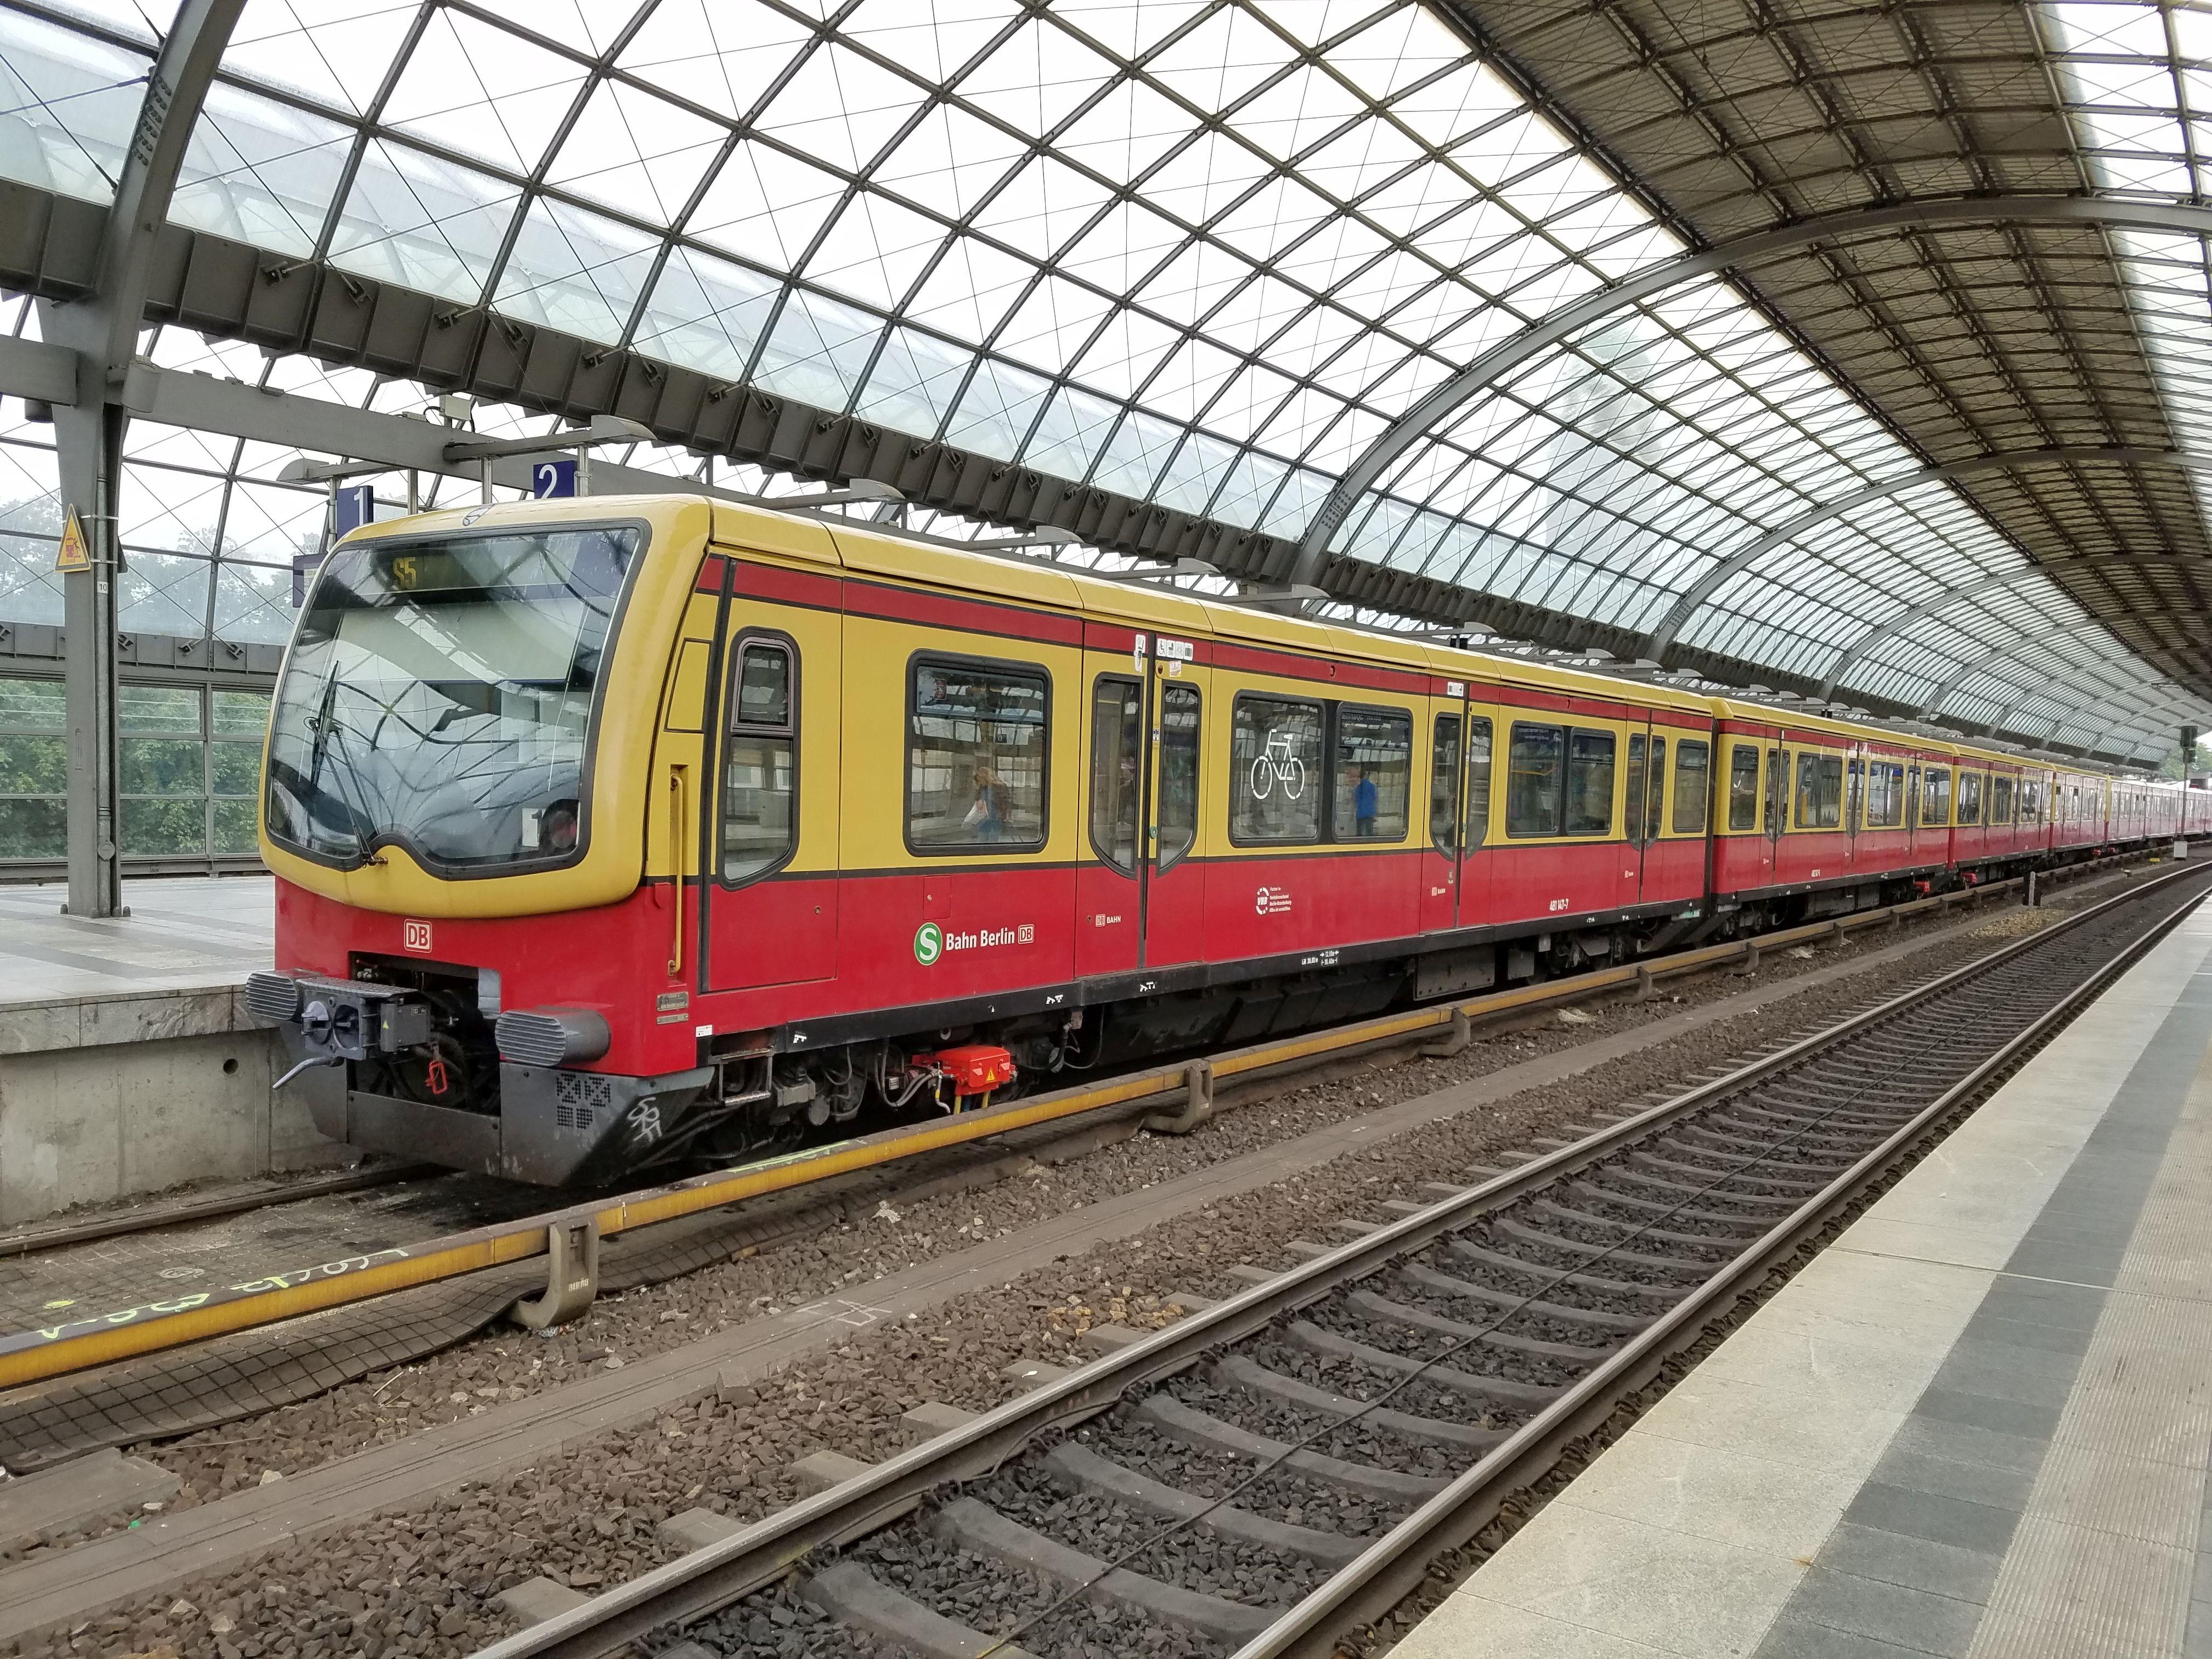 Foto:S-Bahn 481 147, Baureihe481/482, Spandau, 2018